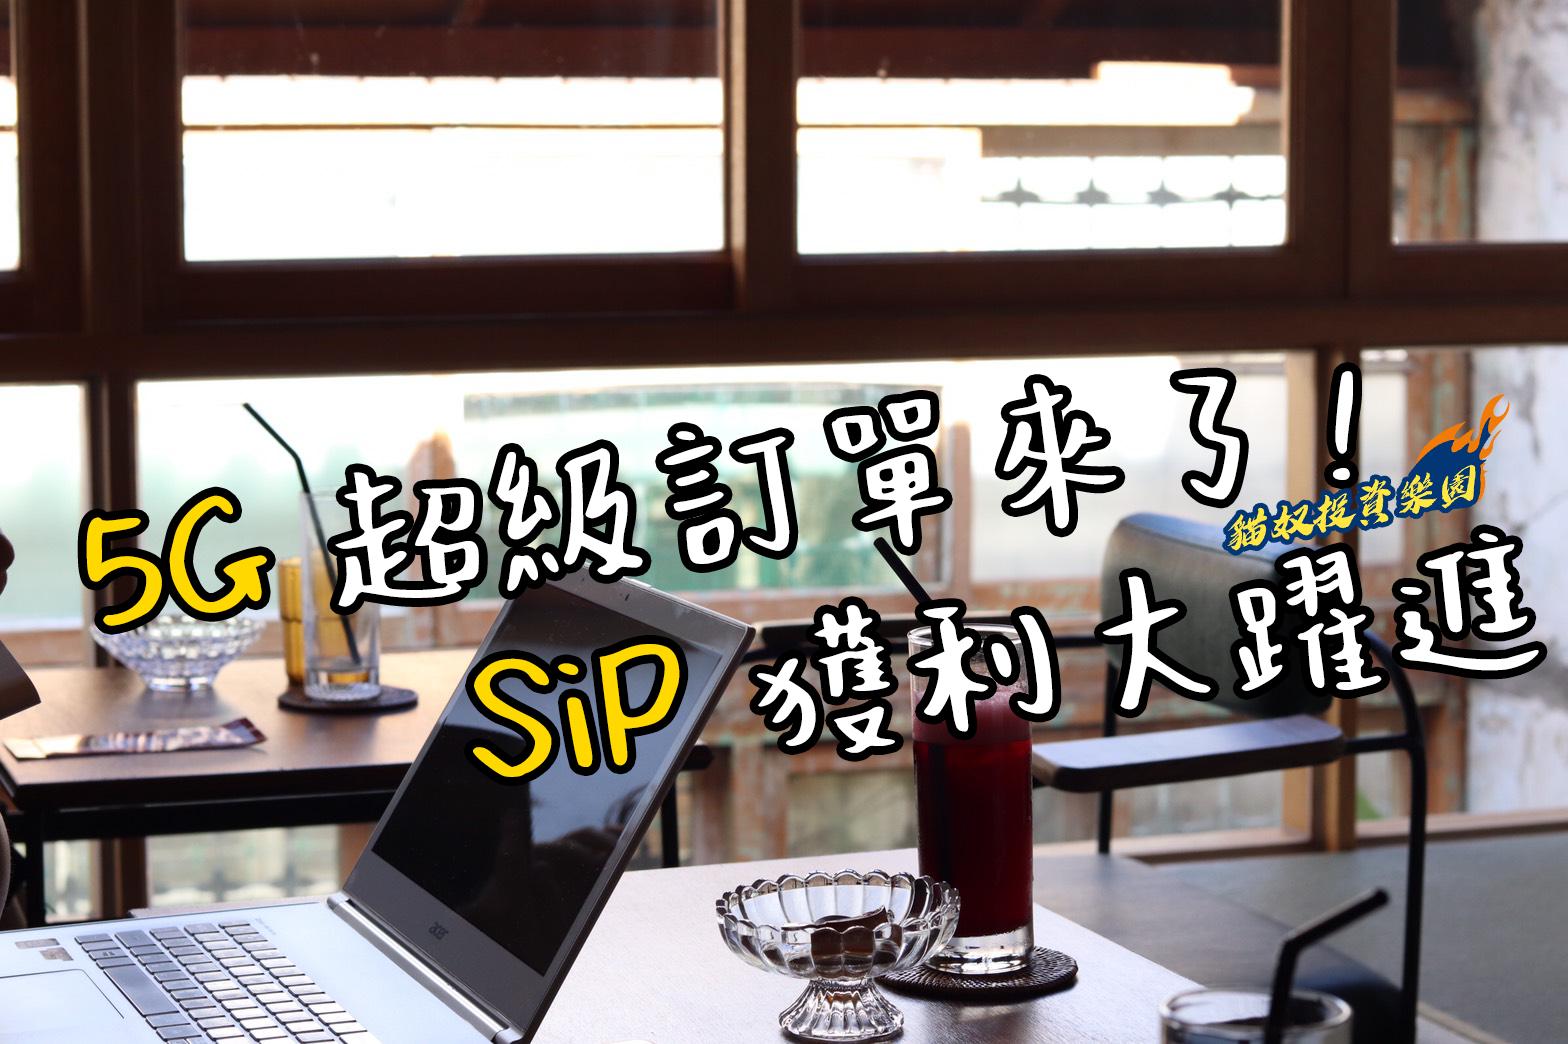 5G 大爆單!鴻海集團金雞 訊芯-KY SiP 擴產效應,獲利持續大躍進!